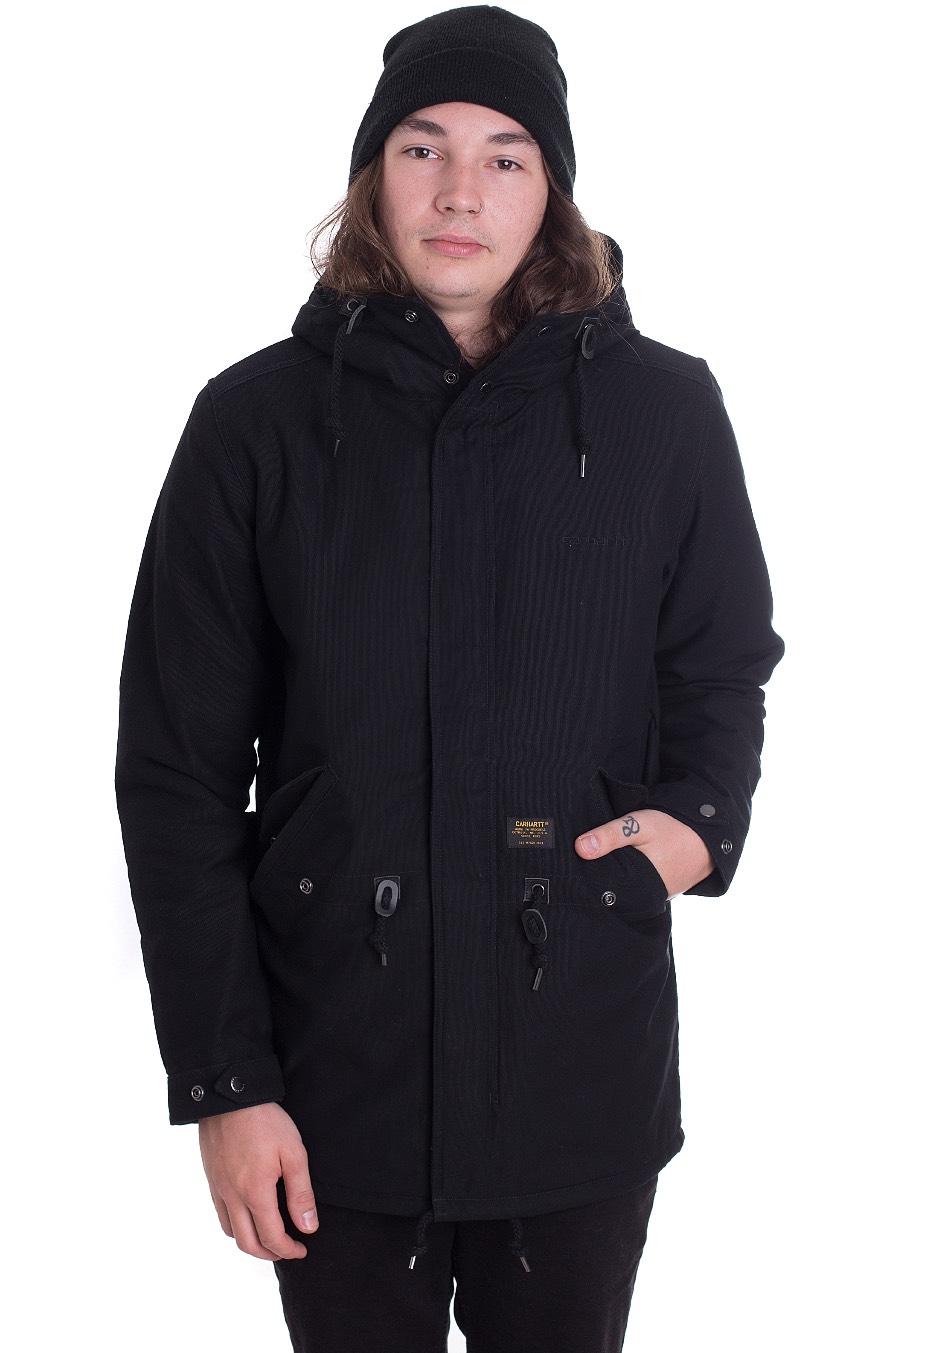 64f094735933 Carhartt WIP - Clash Parka - Jacket - Streetwear Shop - Impericon.com  Worldwide